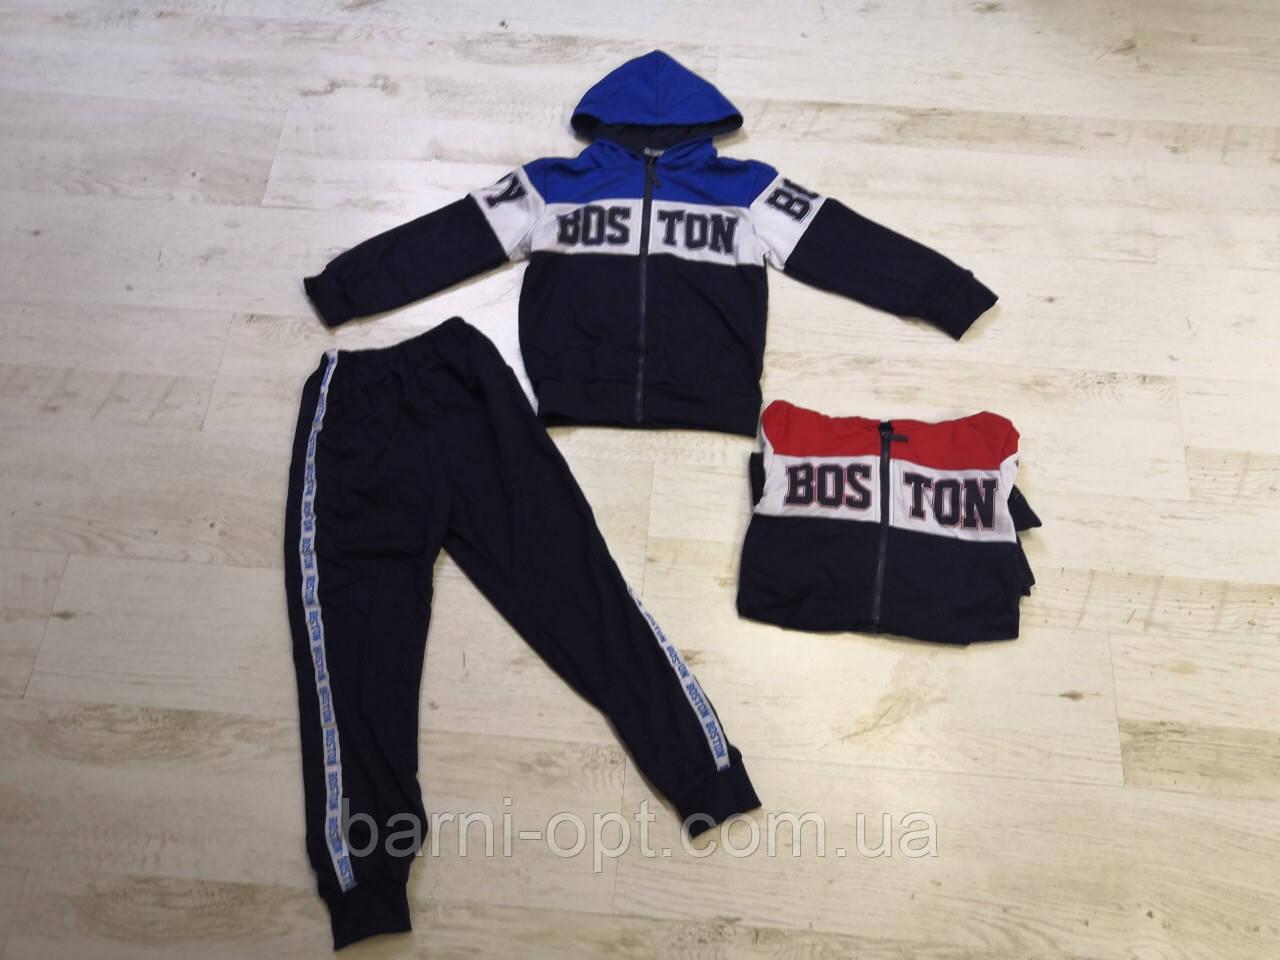 959fee13 Трикотажный спортивный костюм на мальчика оптом, Crossfire, 4-12 рр -